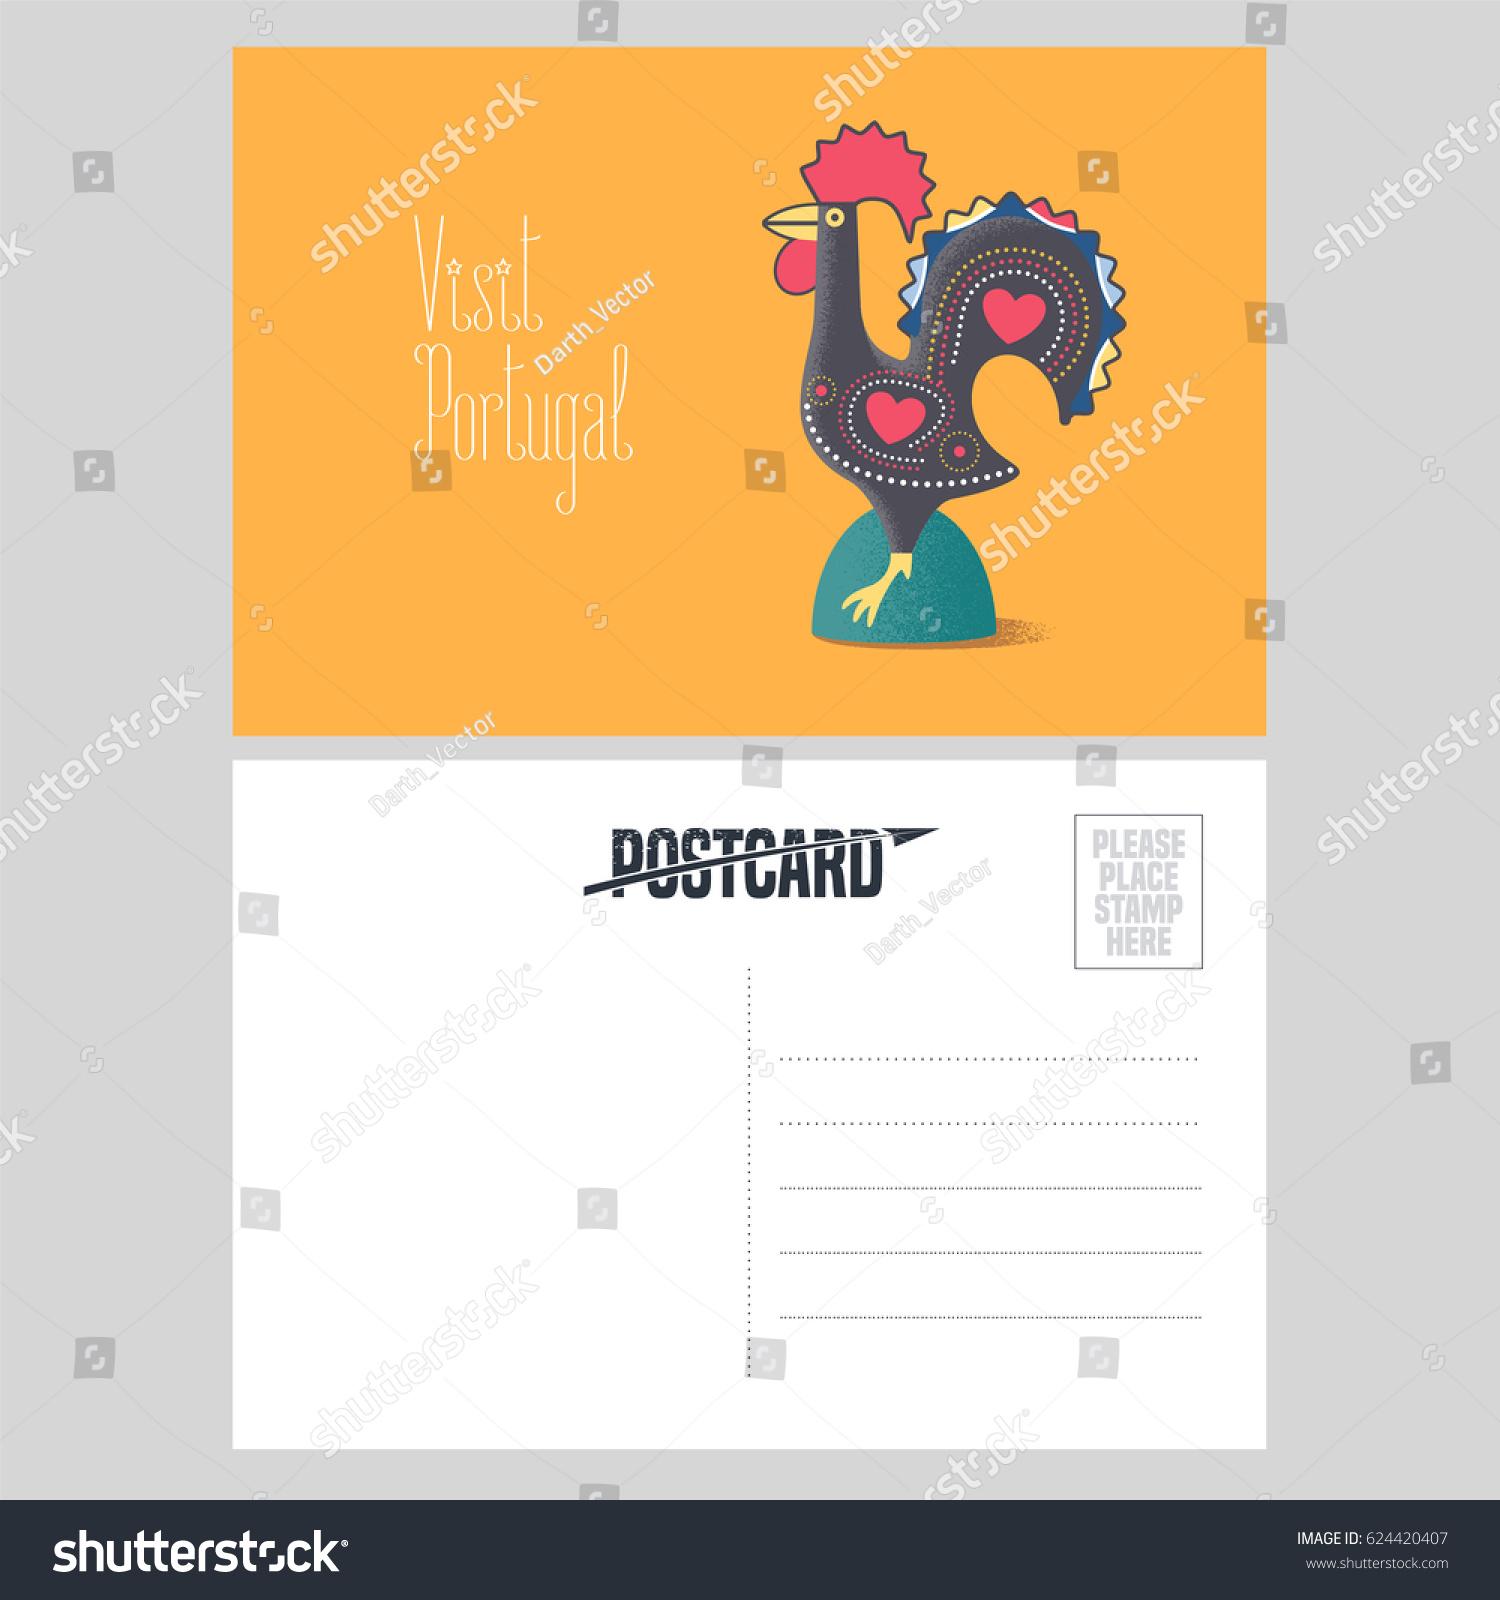 Postcard Portugal Vector Illustration Barcelos Rooster Stock Vector